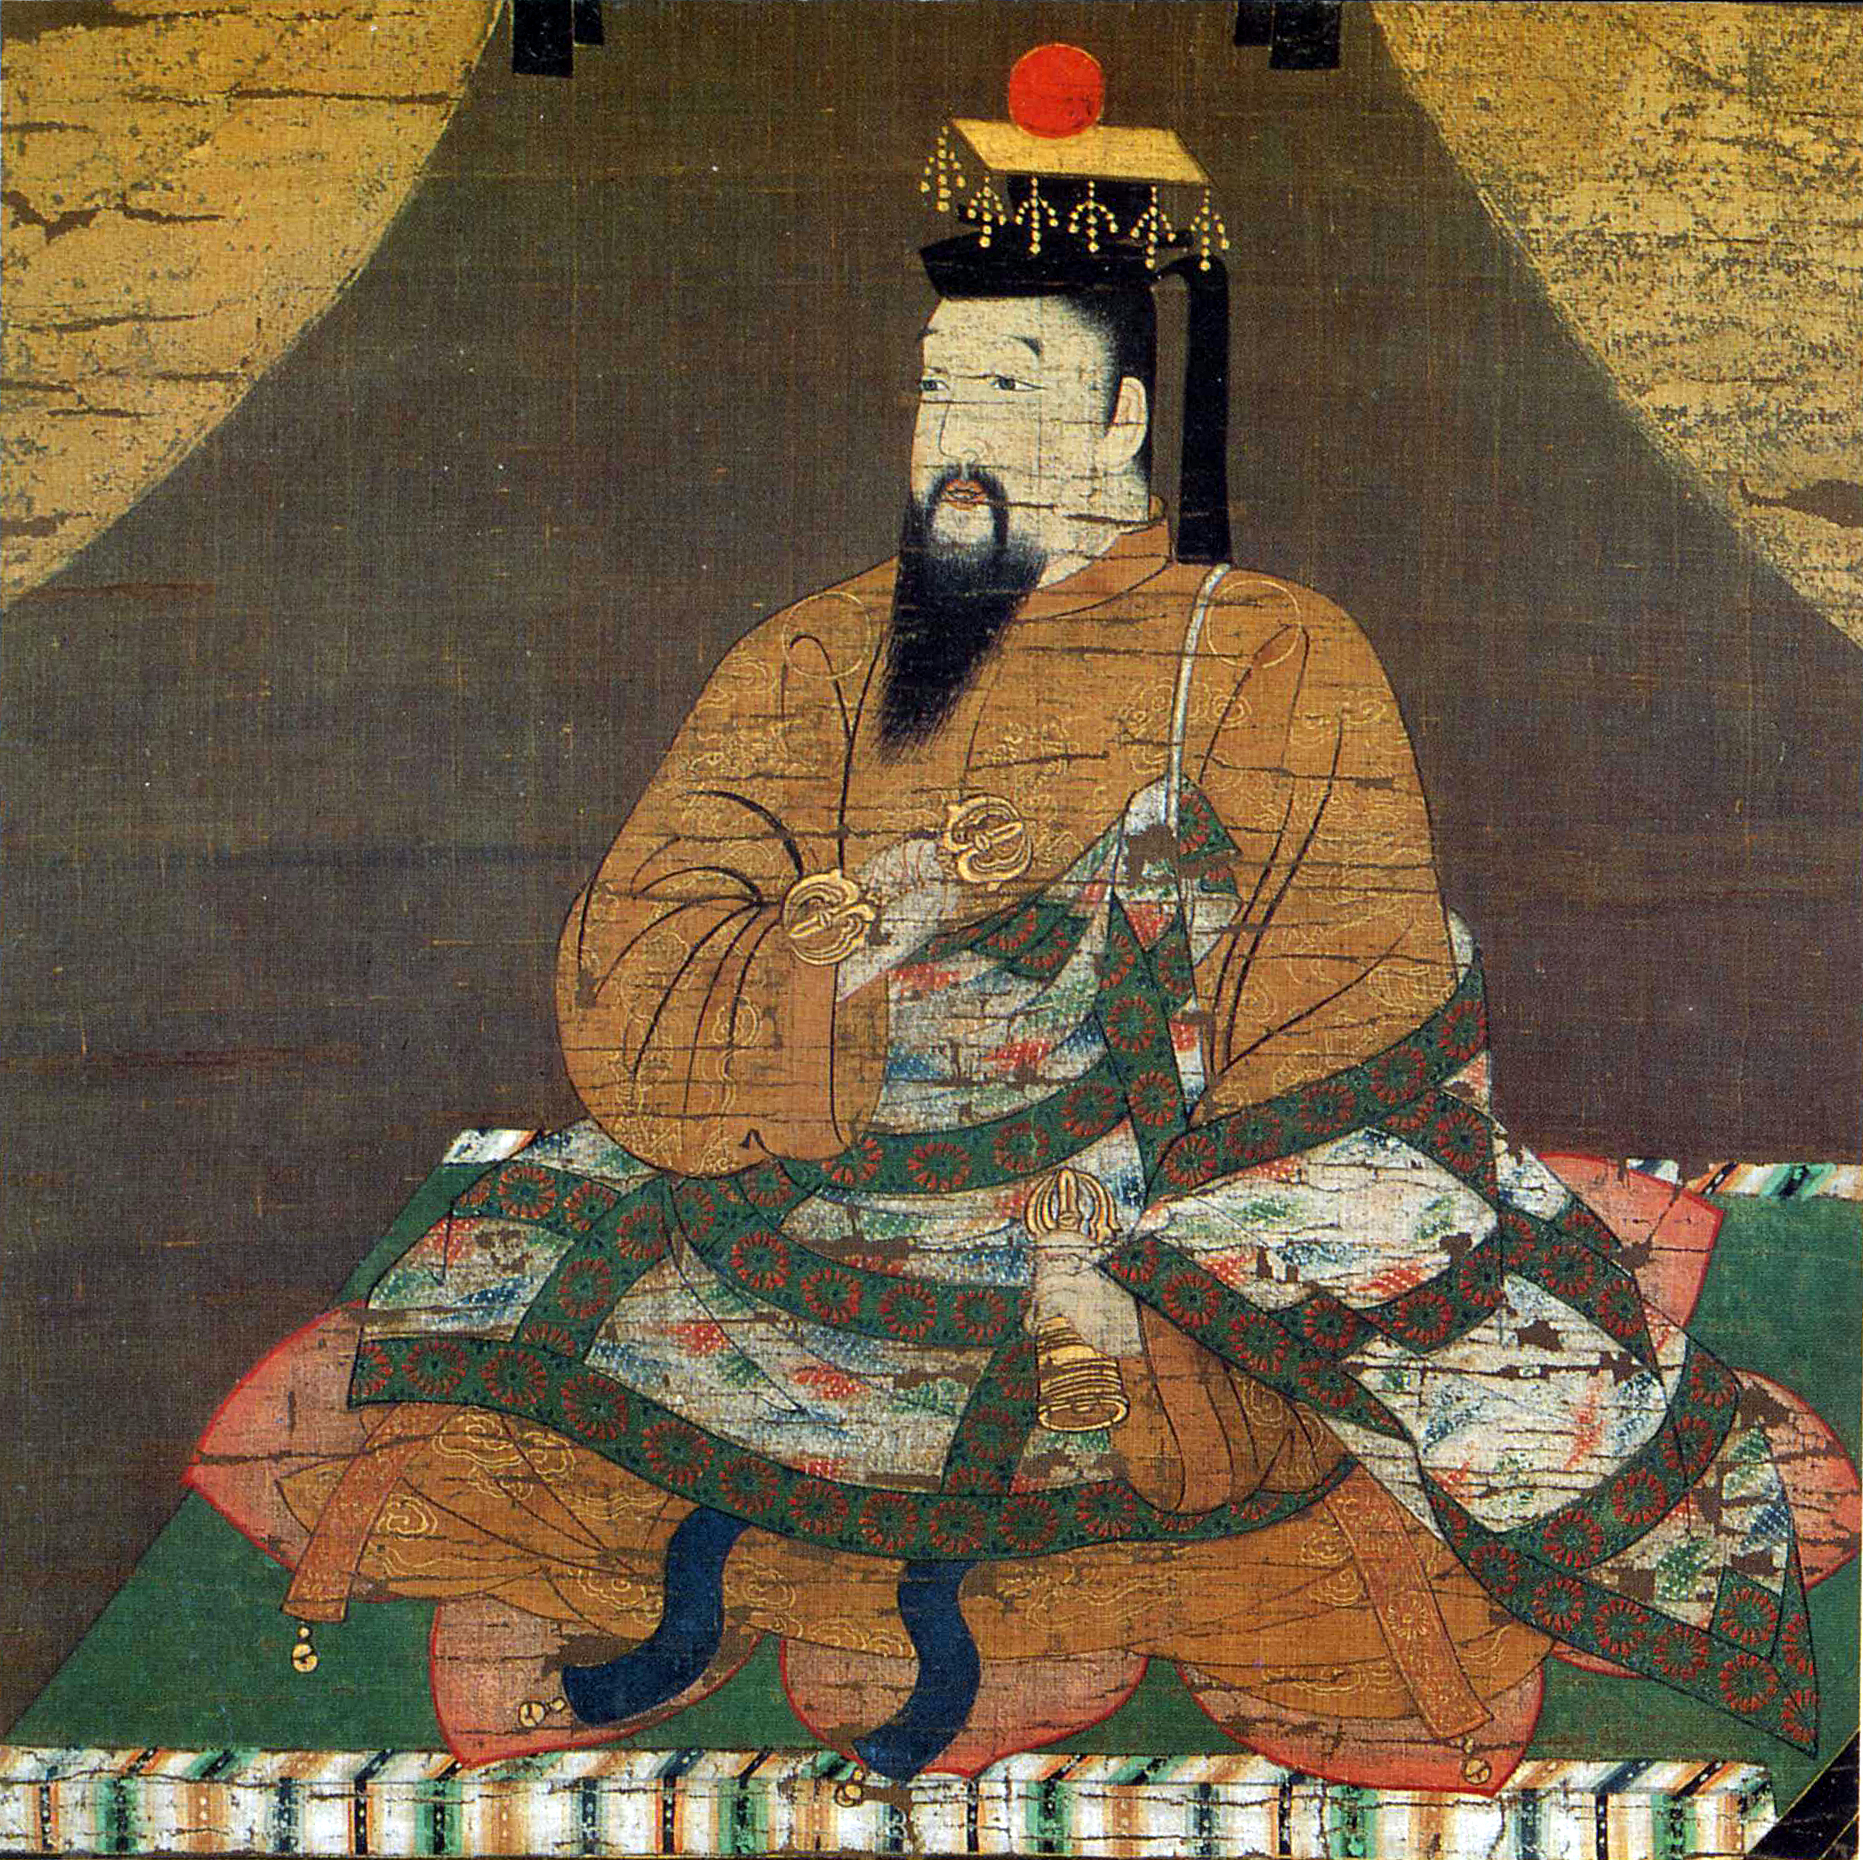 https://upload.wikimedia.org/wikipedia/commons/5/59/Emperor_Godaigo.jpg